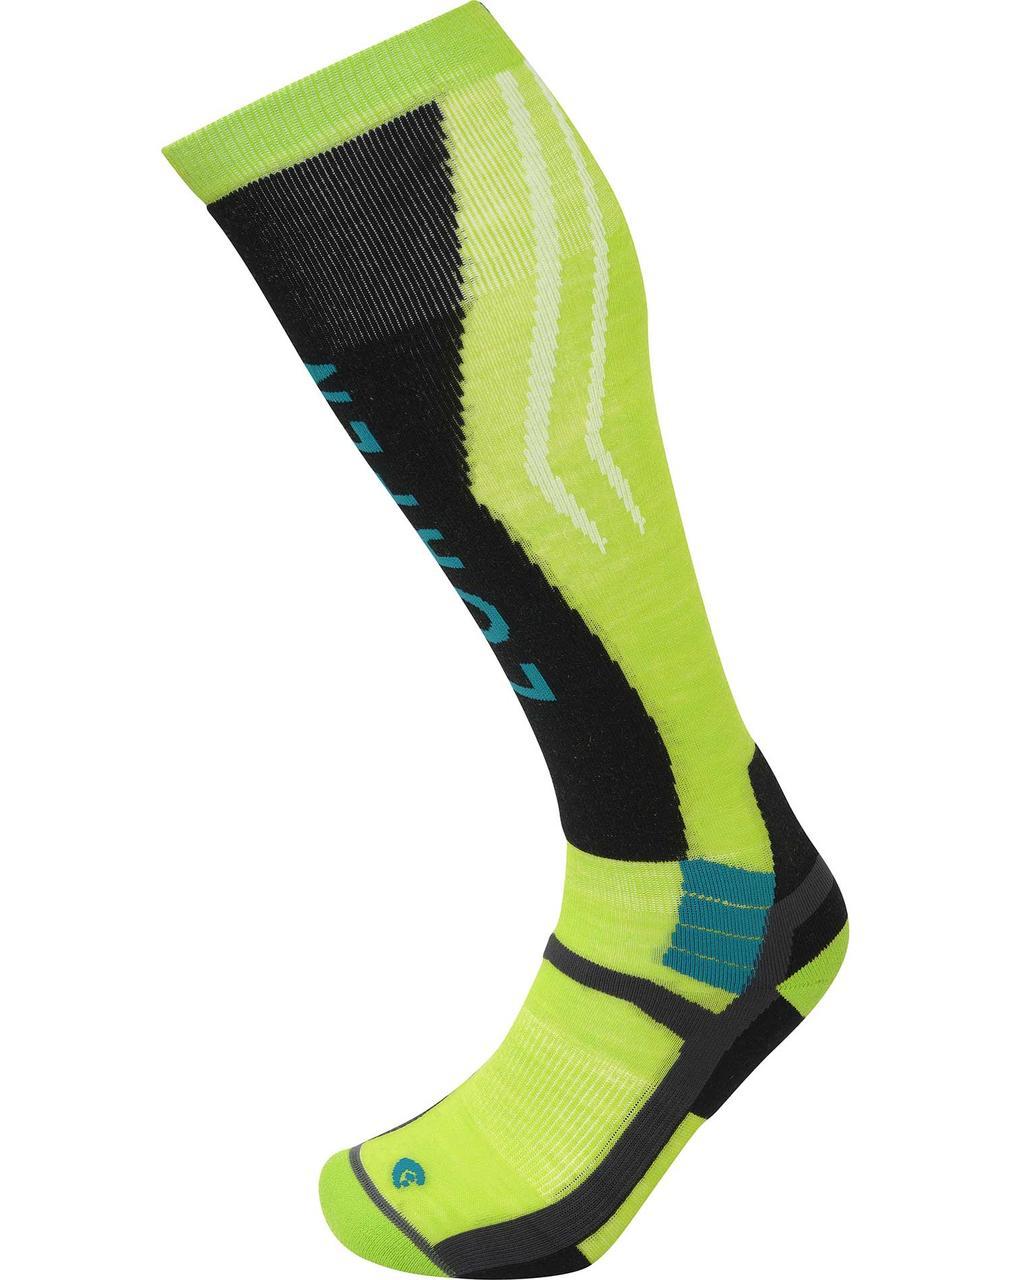 Шкарпетки Lorpen T3 Ski Mountaineering S3SMG Green Lime S (6210187 5448 S)